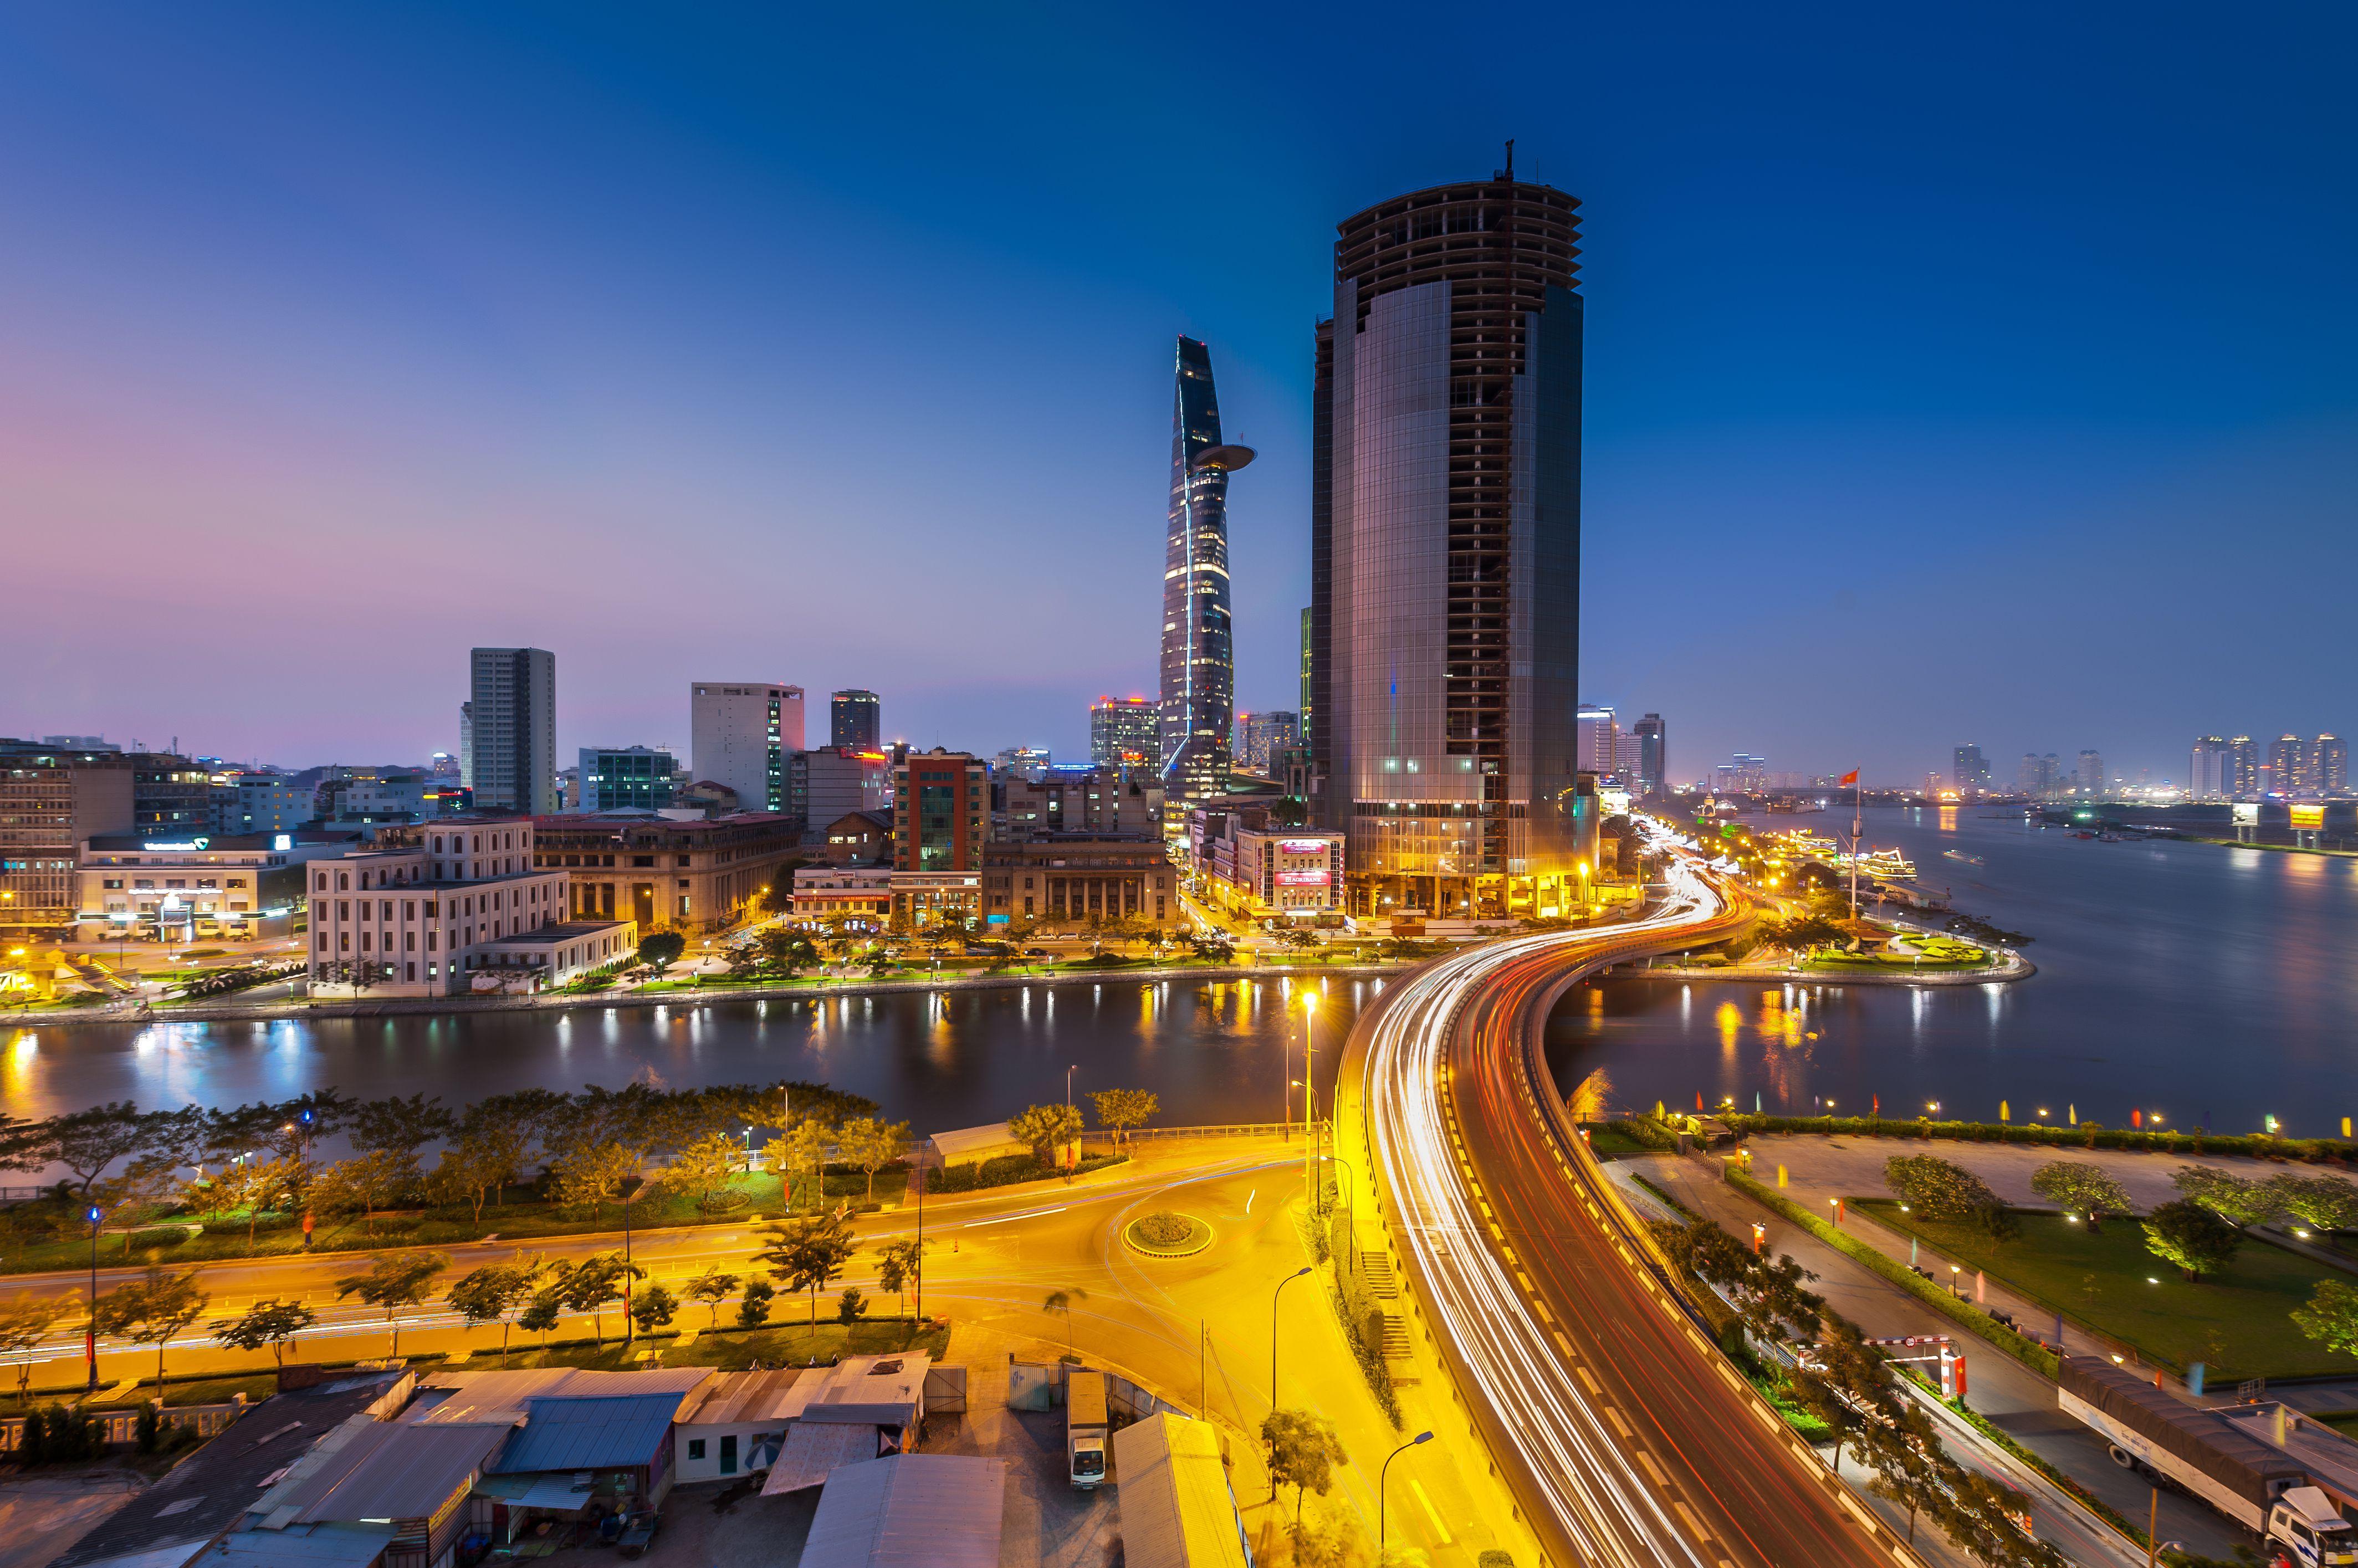 Saigon (Ho Chi Minh City) at night